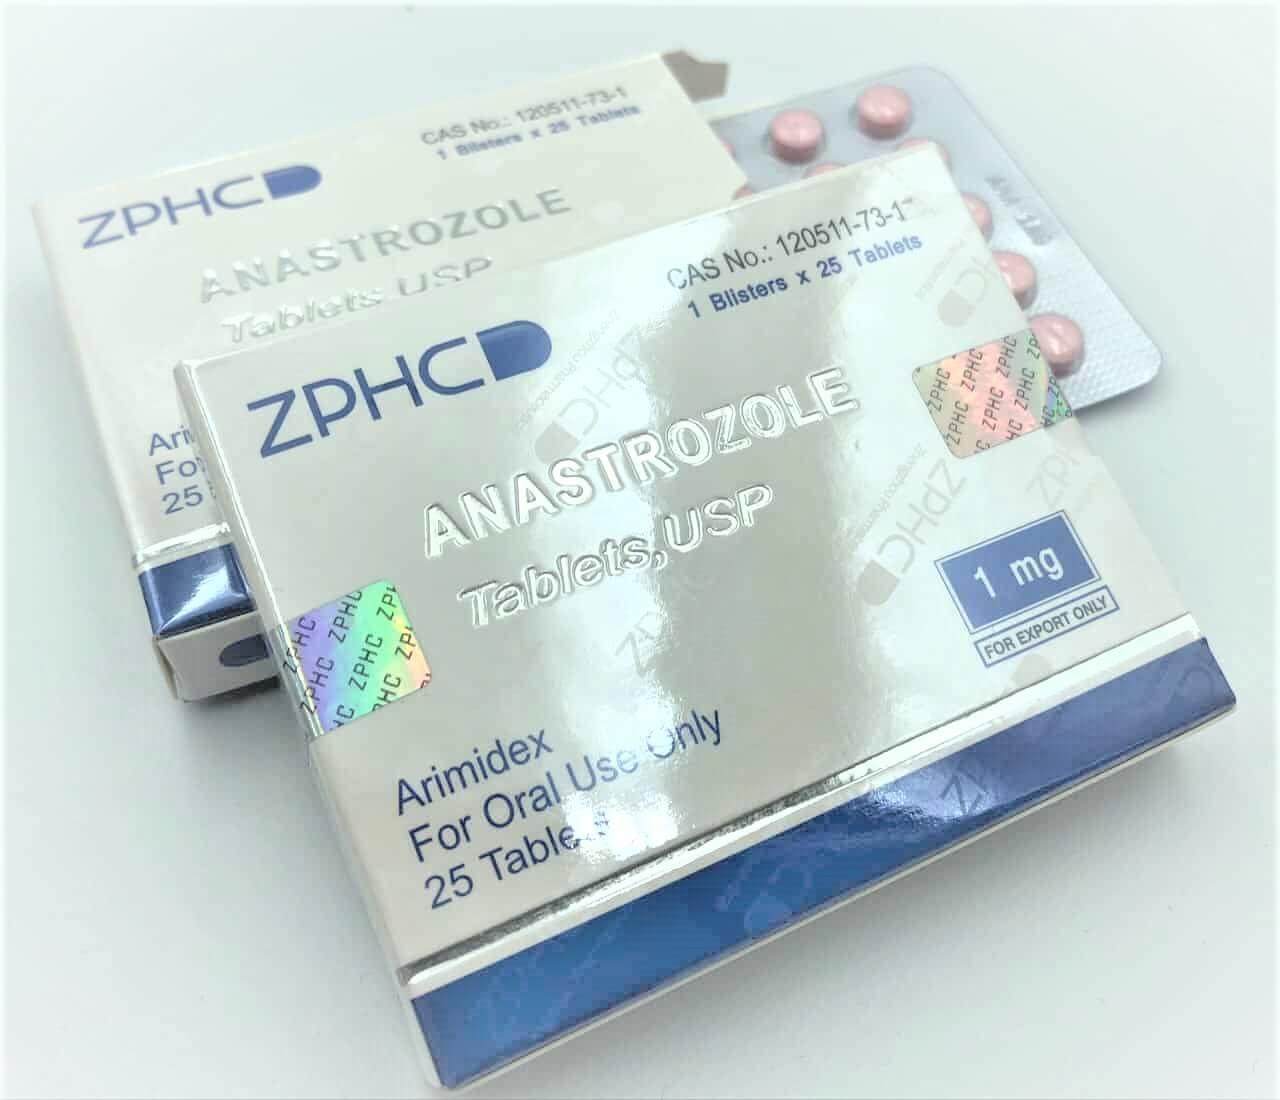 Arimidex Anastrozole 1mg tablet USA ZPHC